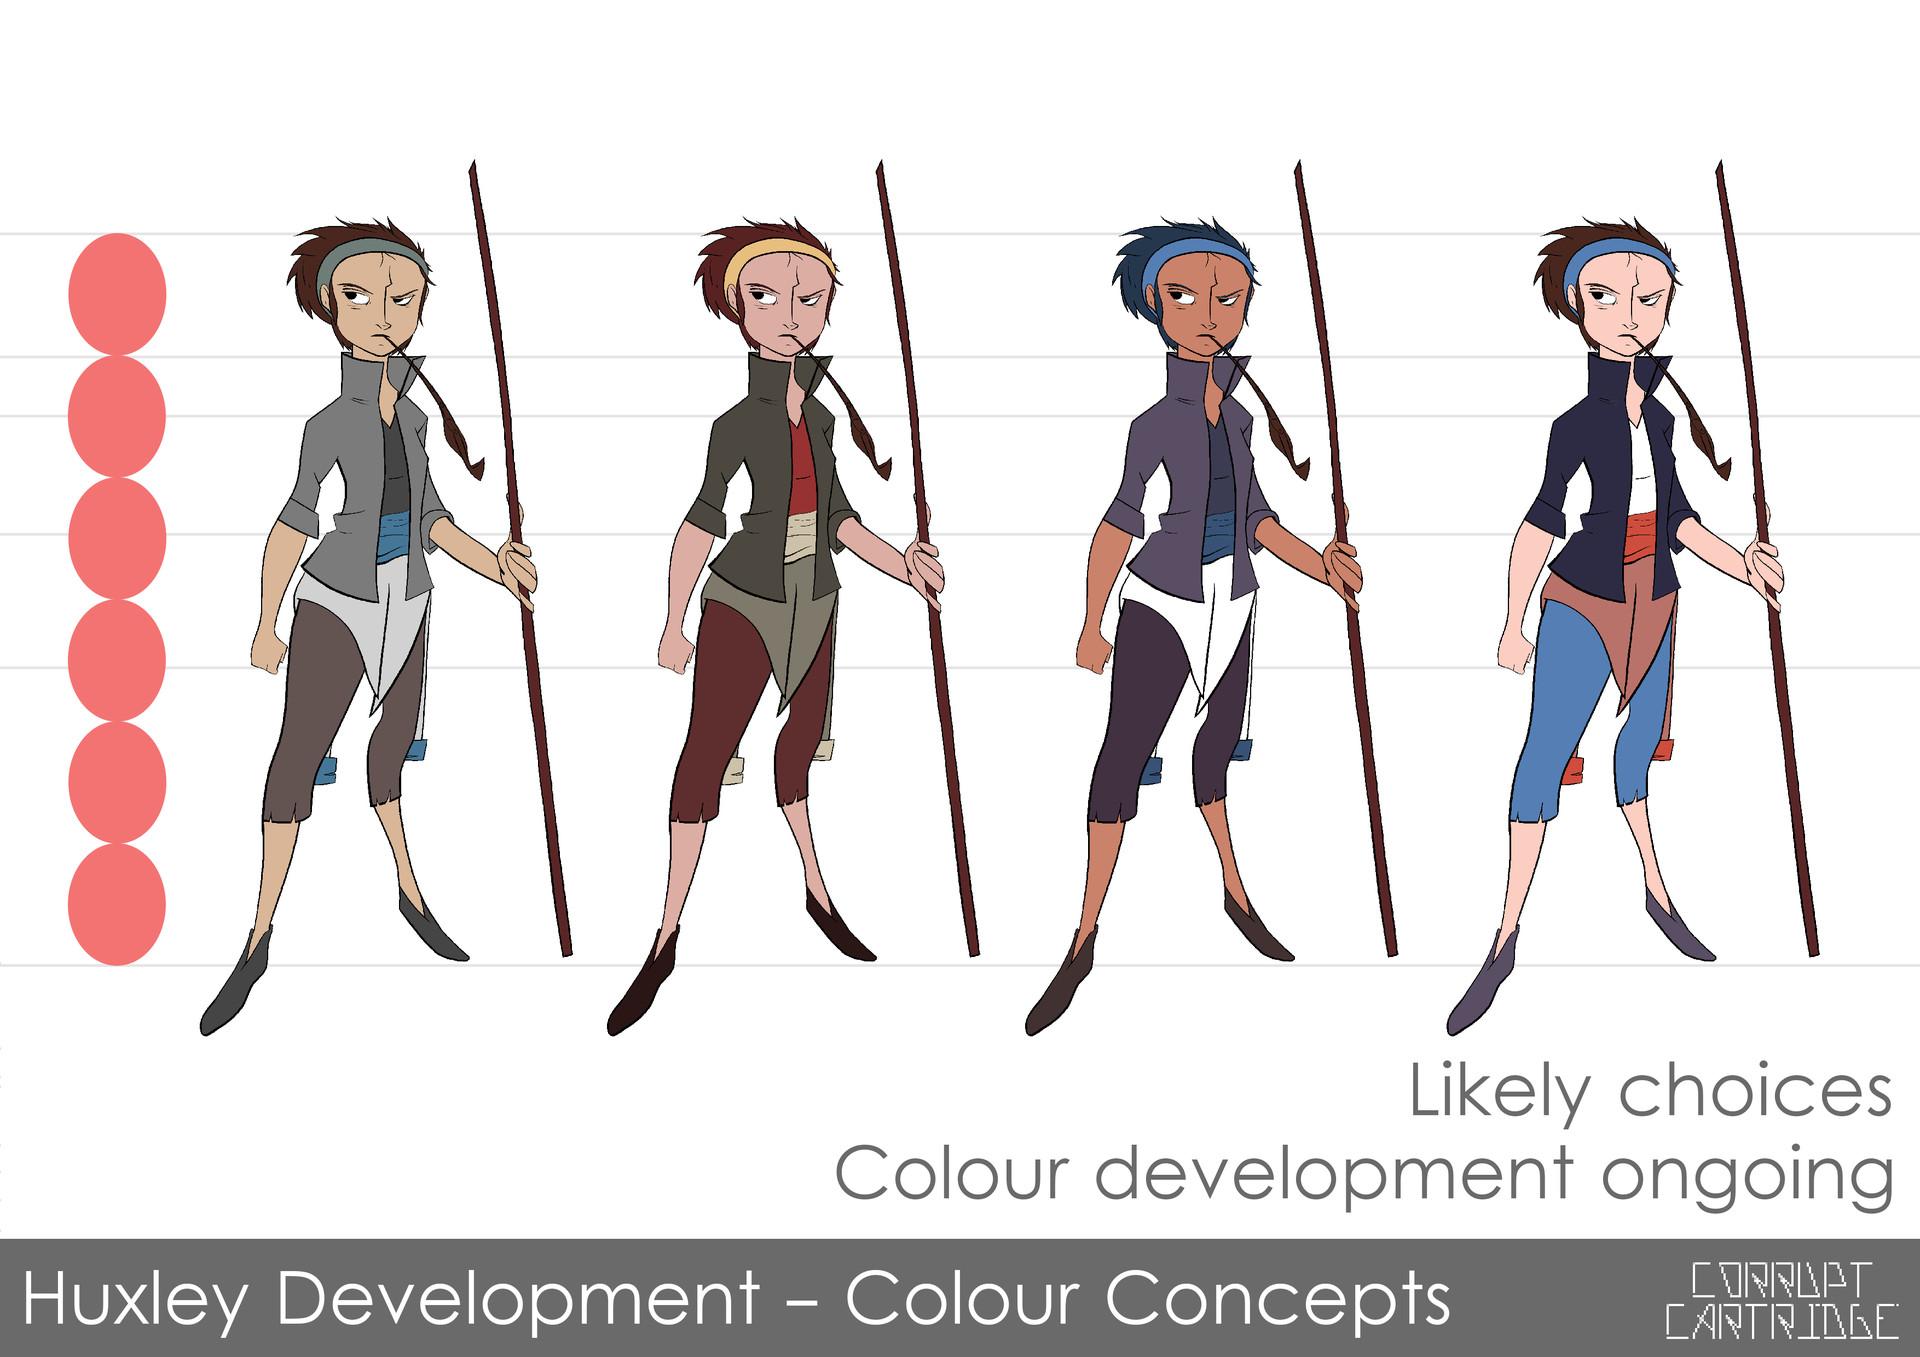 Craig mullins 10 huxley colour concepts 03